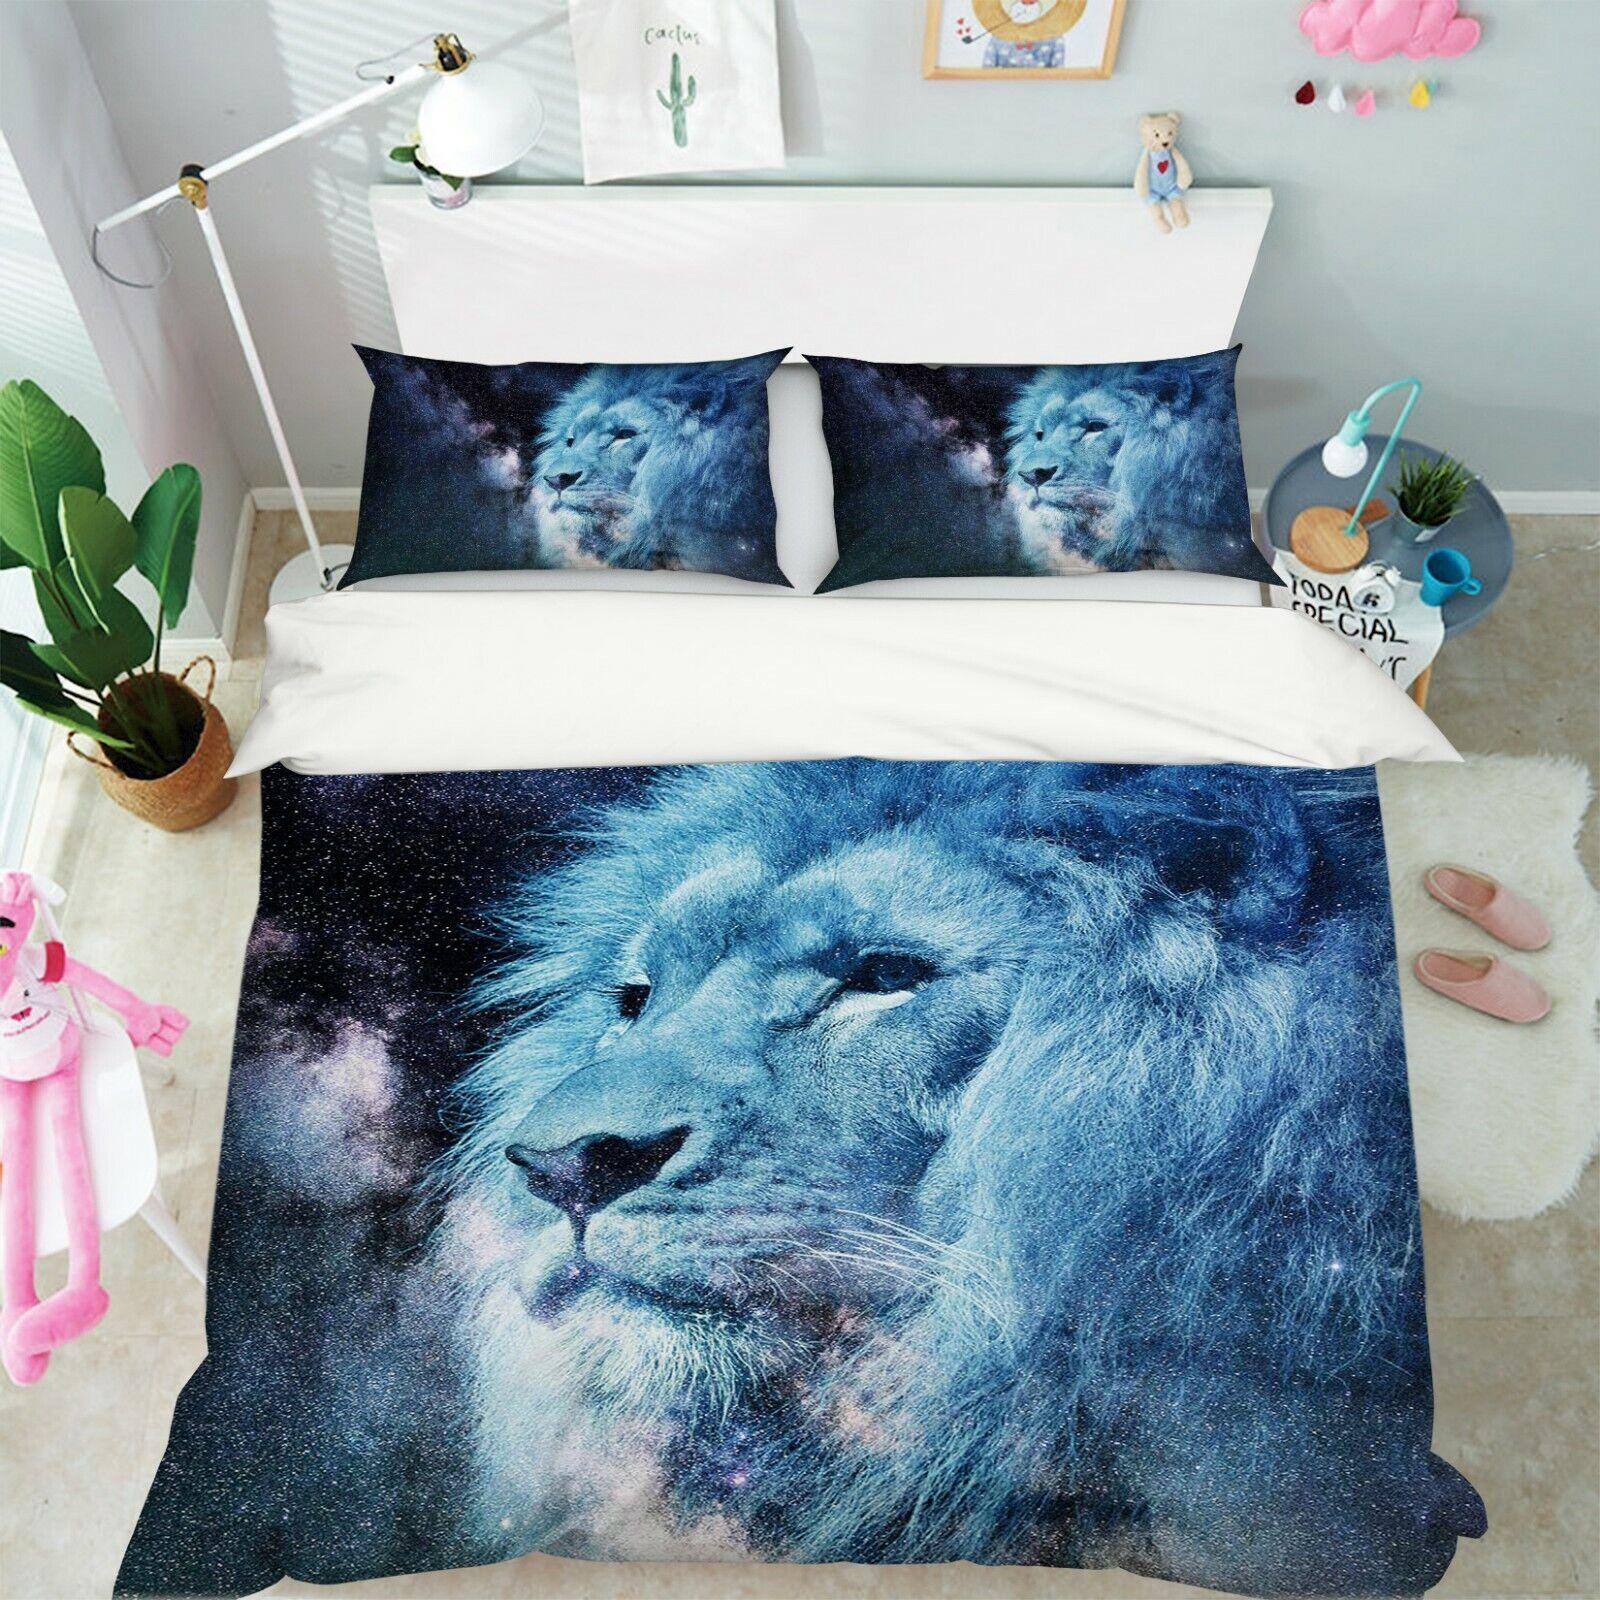 3D Löwe M69 Tier Bett Kissenbezüge Decke Bettdecke Abdeckung Set Angelia